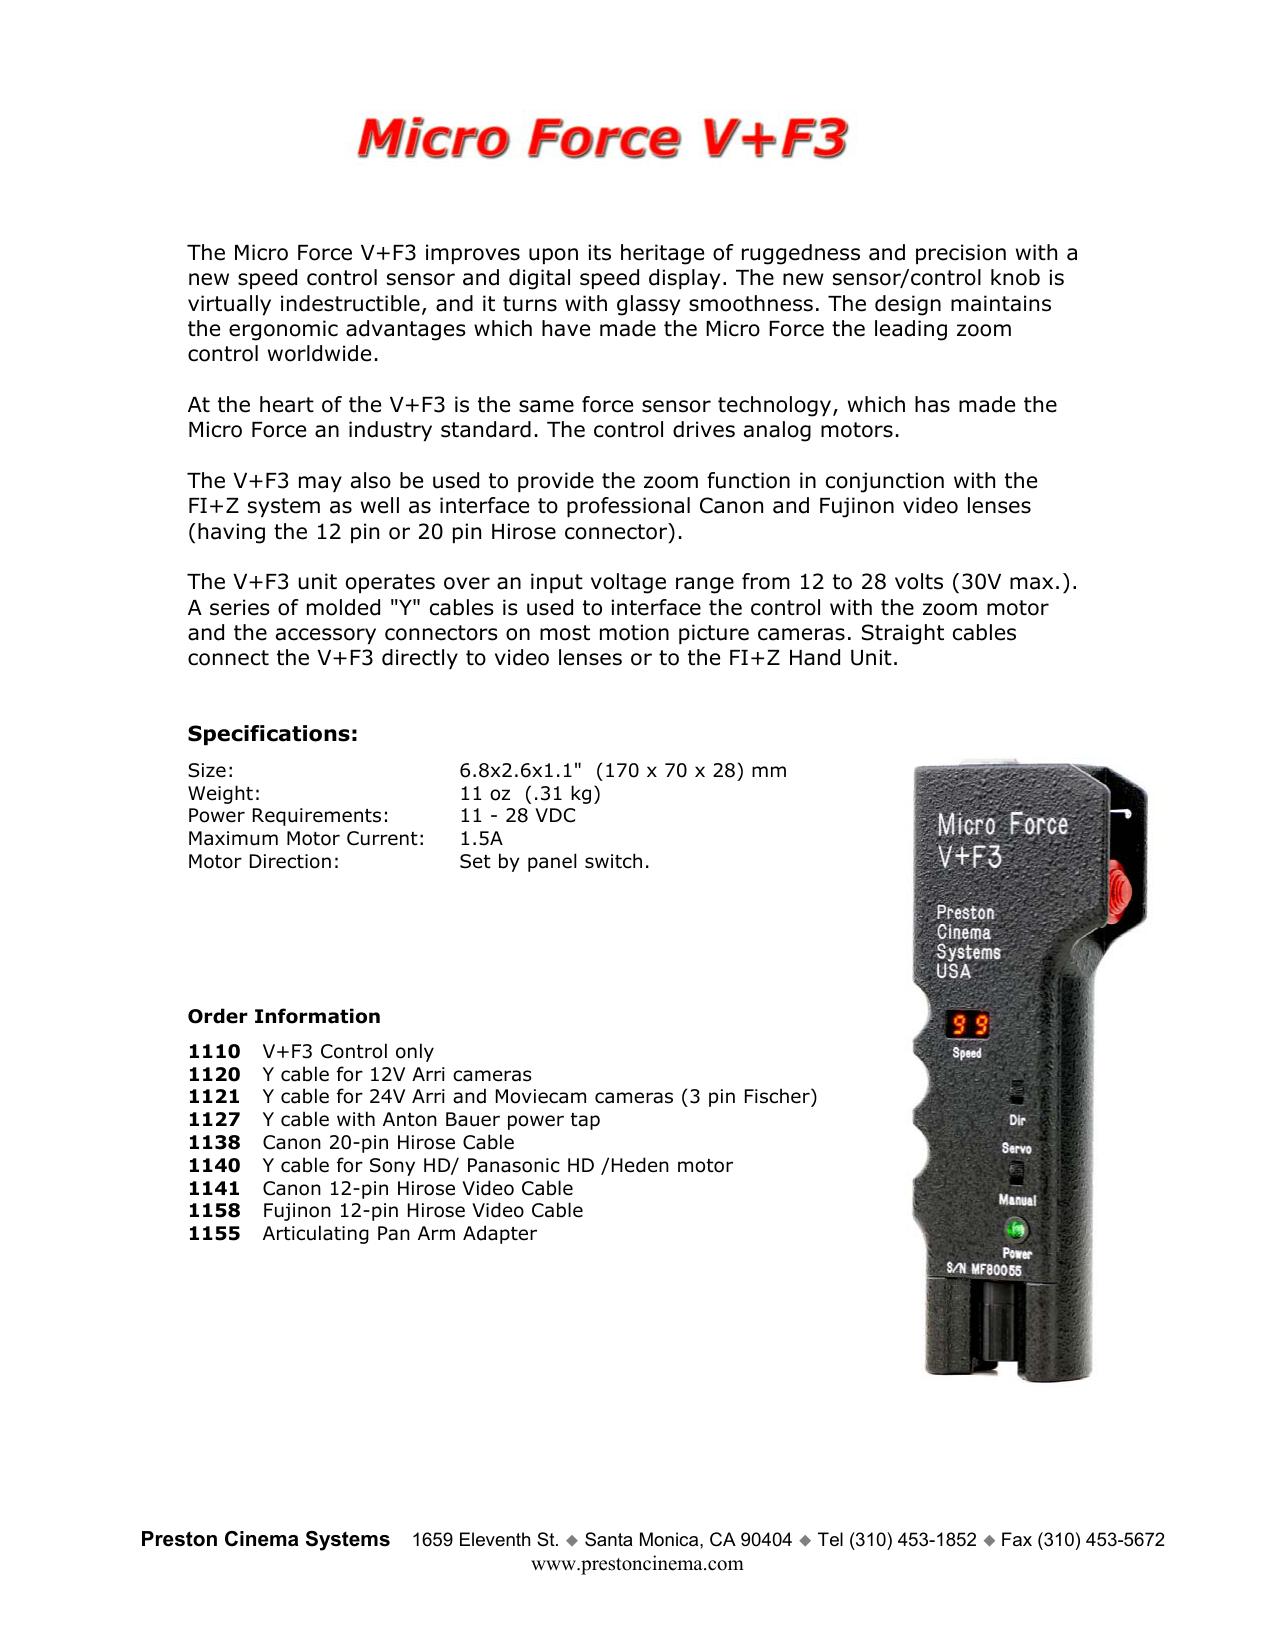 Micro Force V+F3 - Preston Cinema Systems   manualzz com